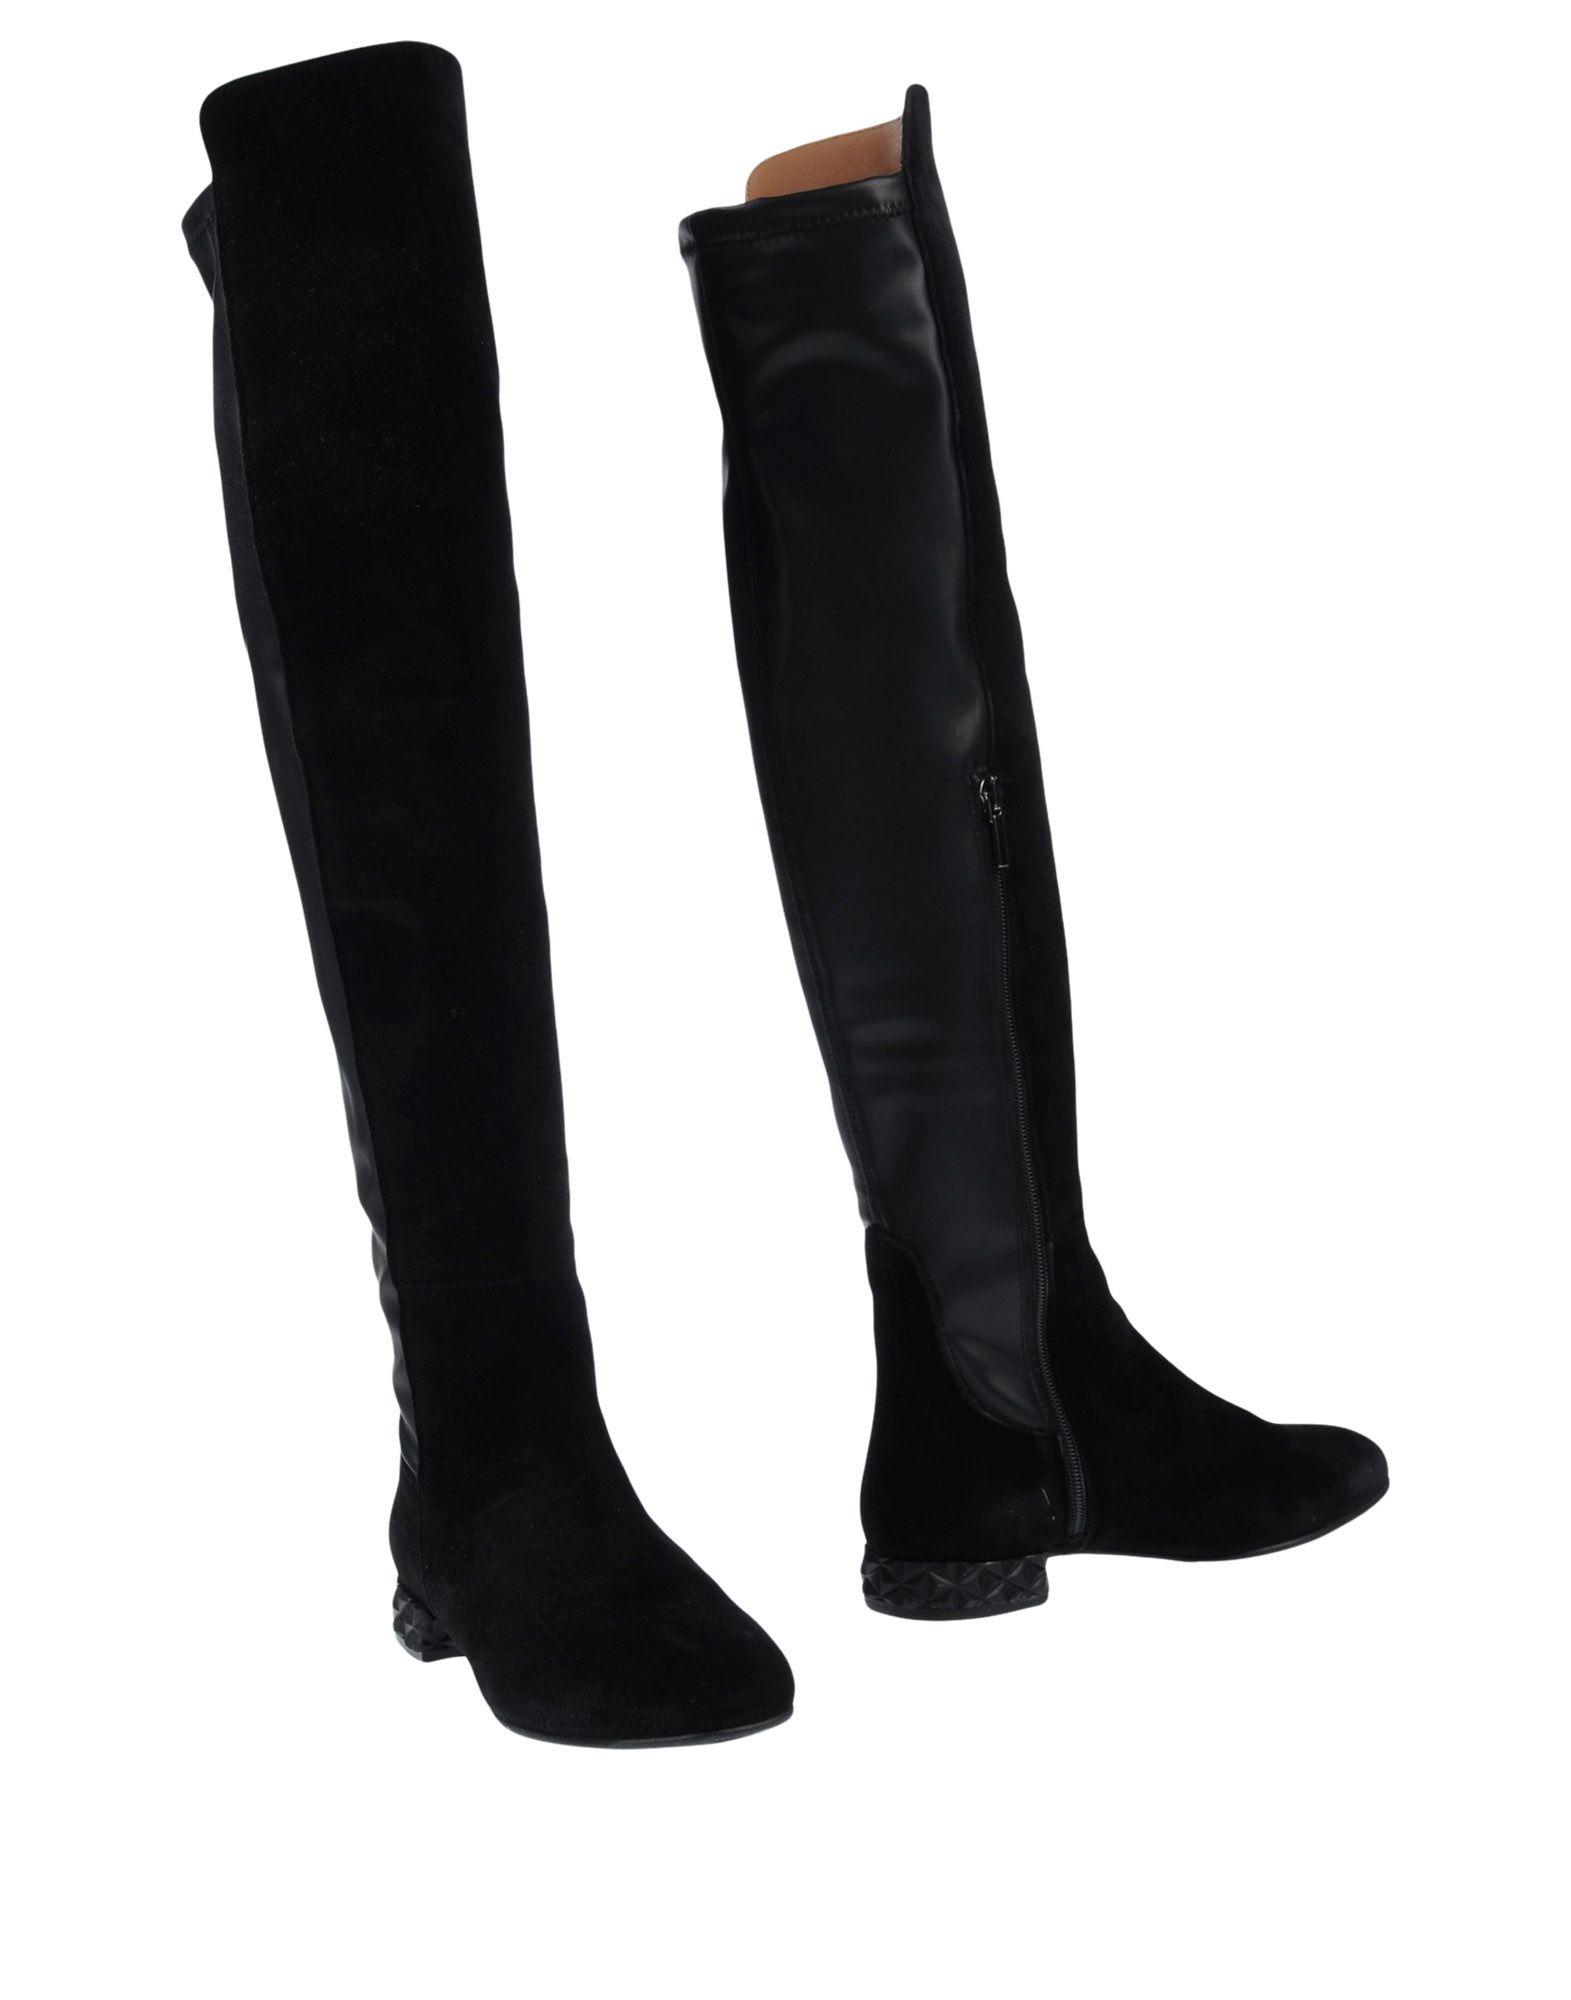 Moda Stivali Ancarani Ancarani Stivali Donna - 11495994HB 143abc